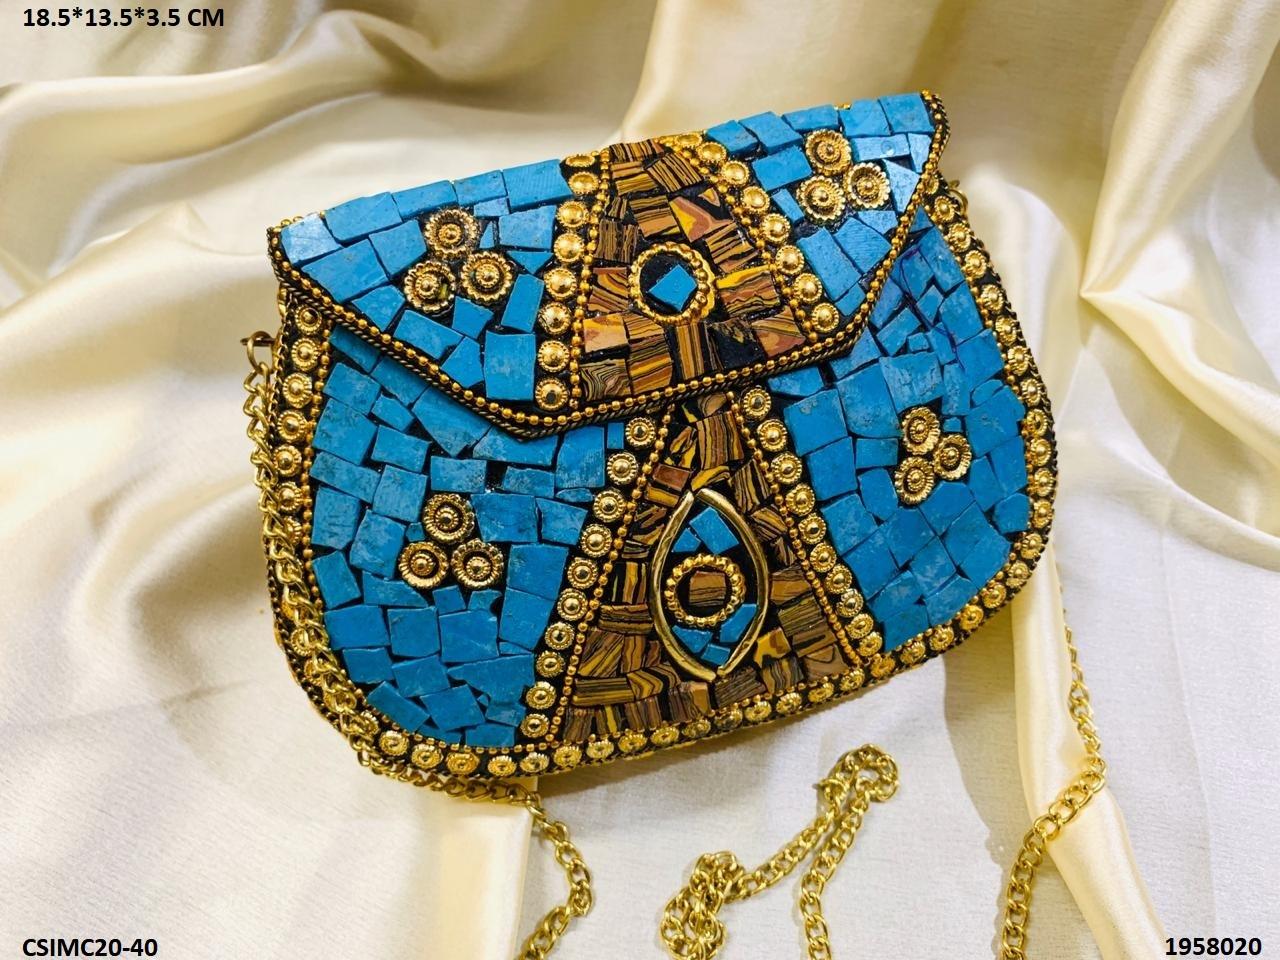 Antique Mosaic Metal Clutch Bag